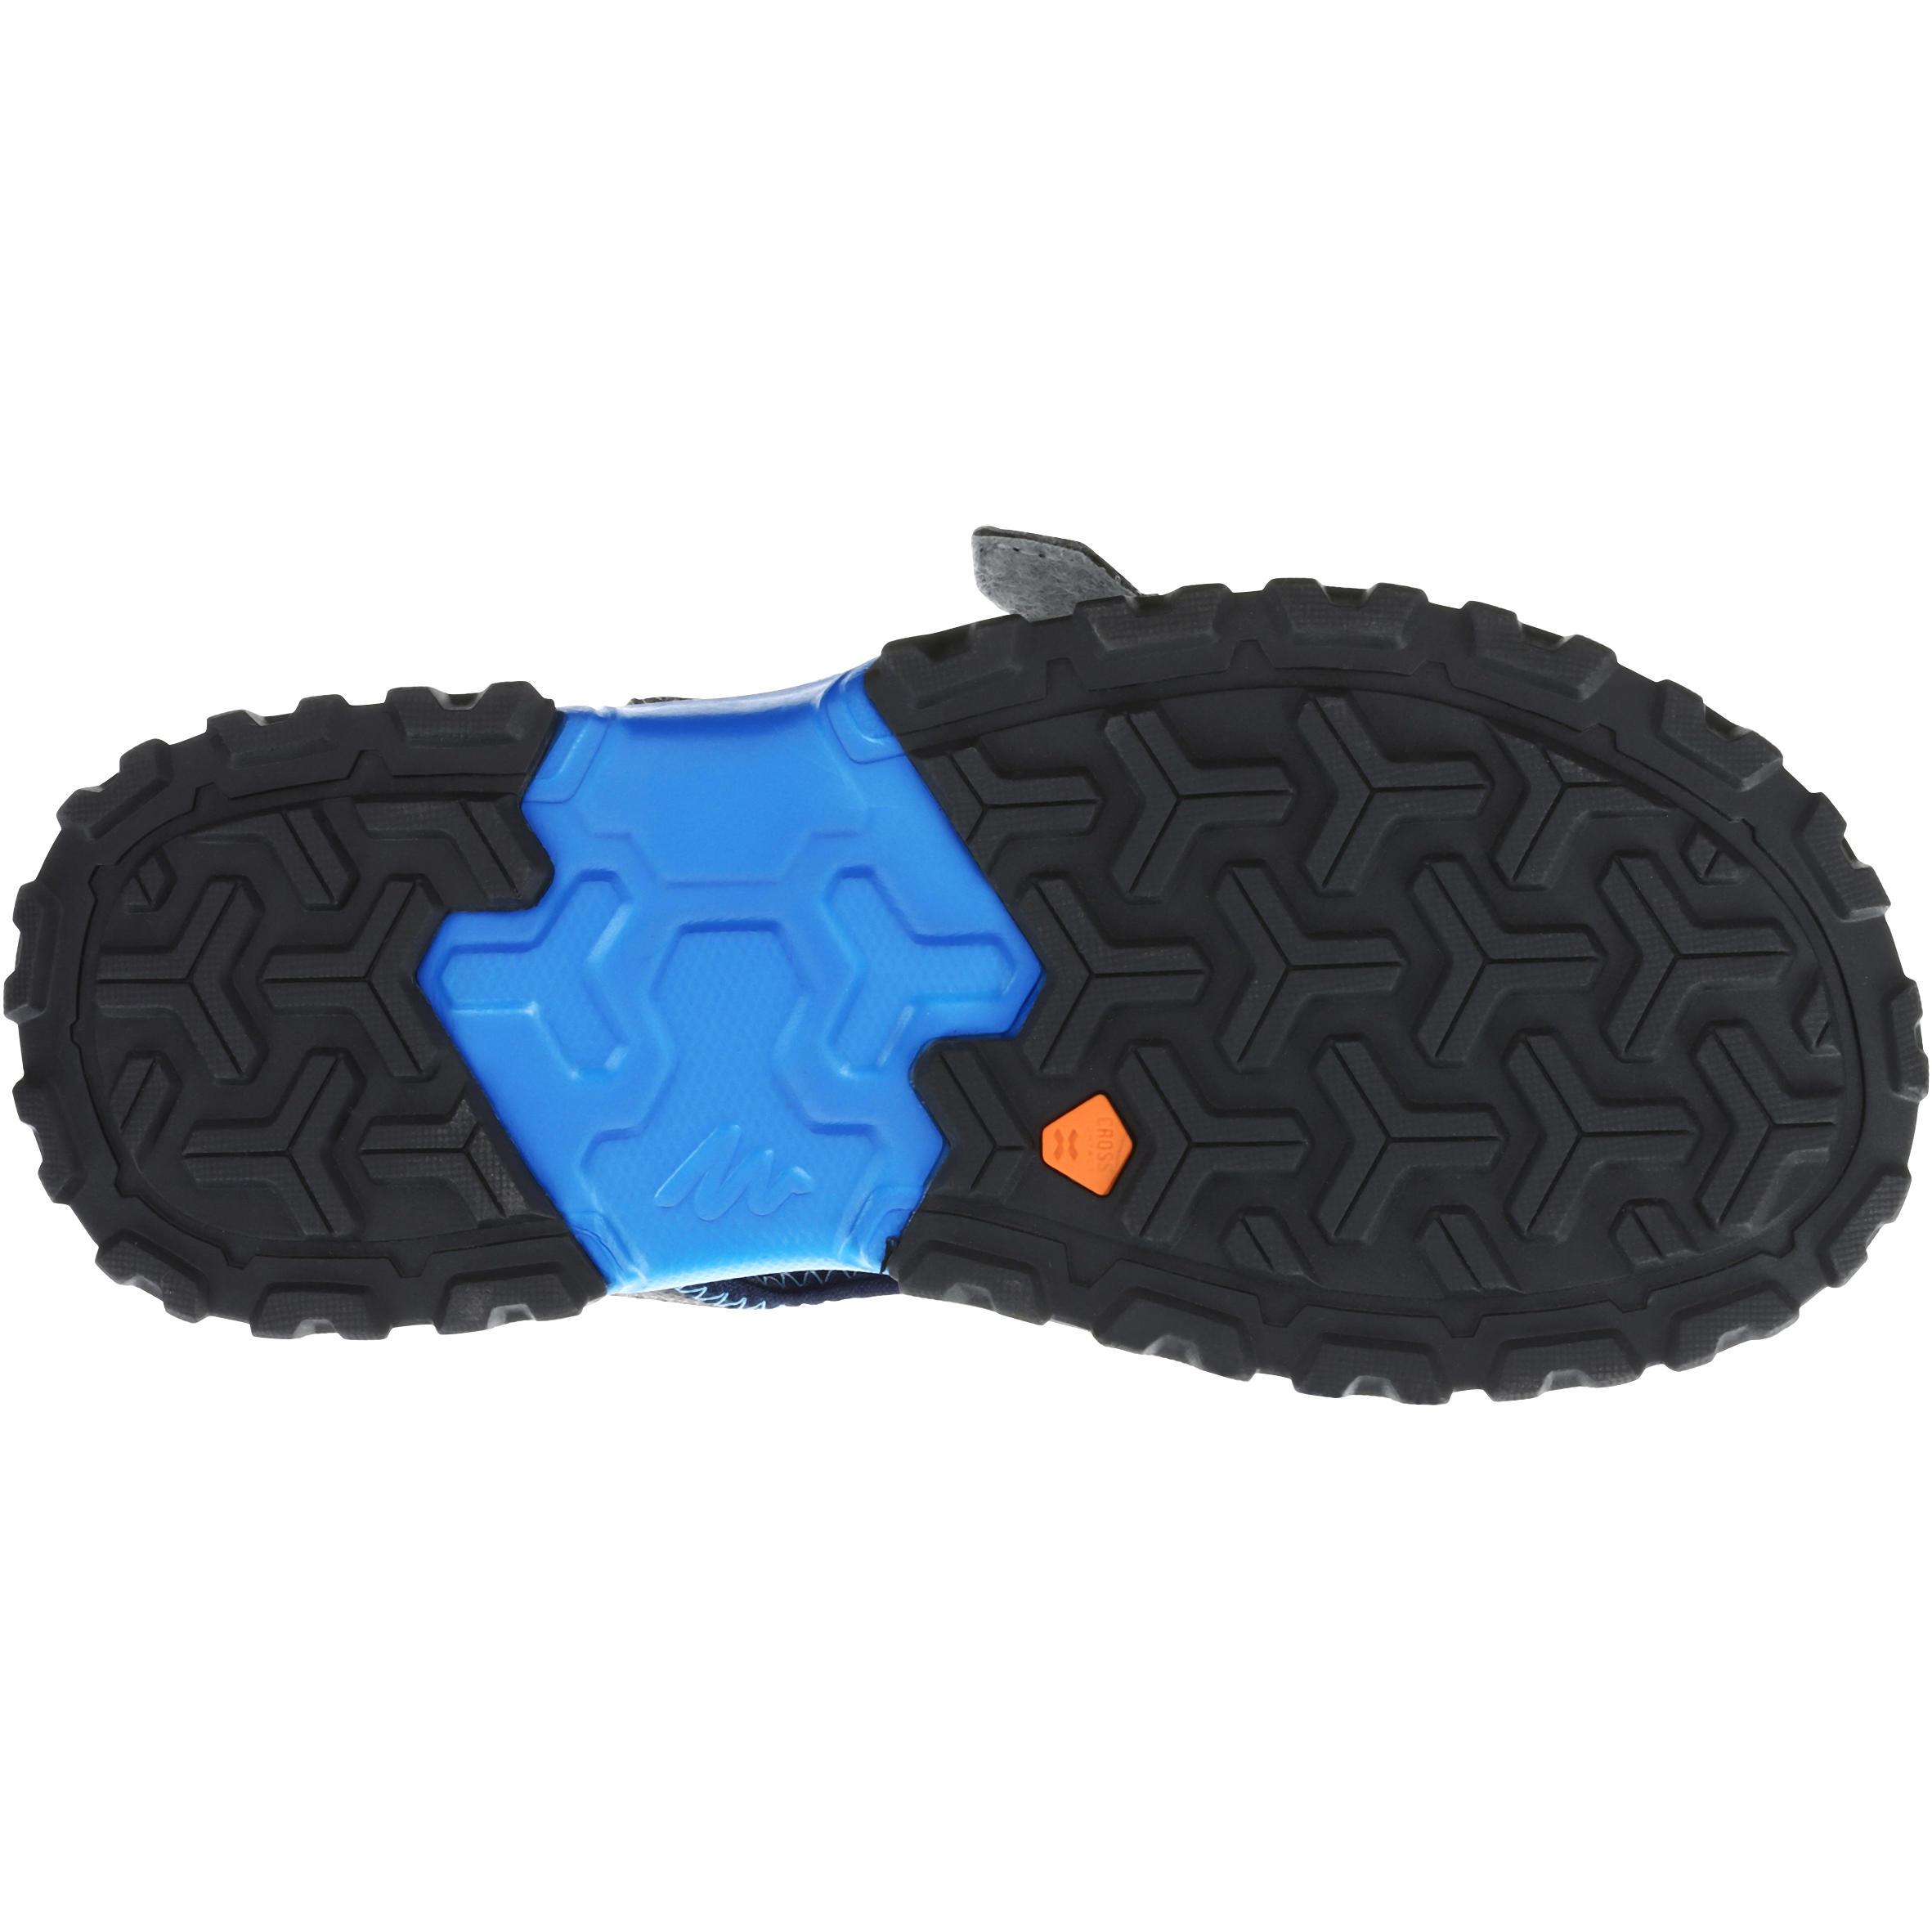 Children's MH120 JR hiking sandals - Pix Blue